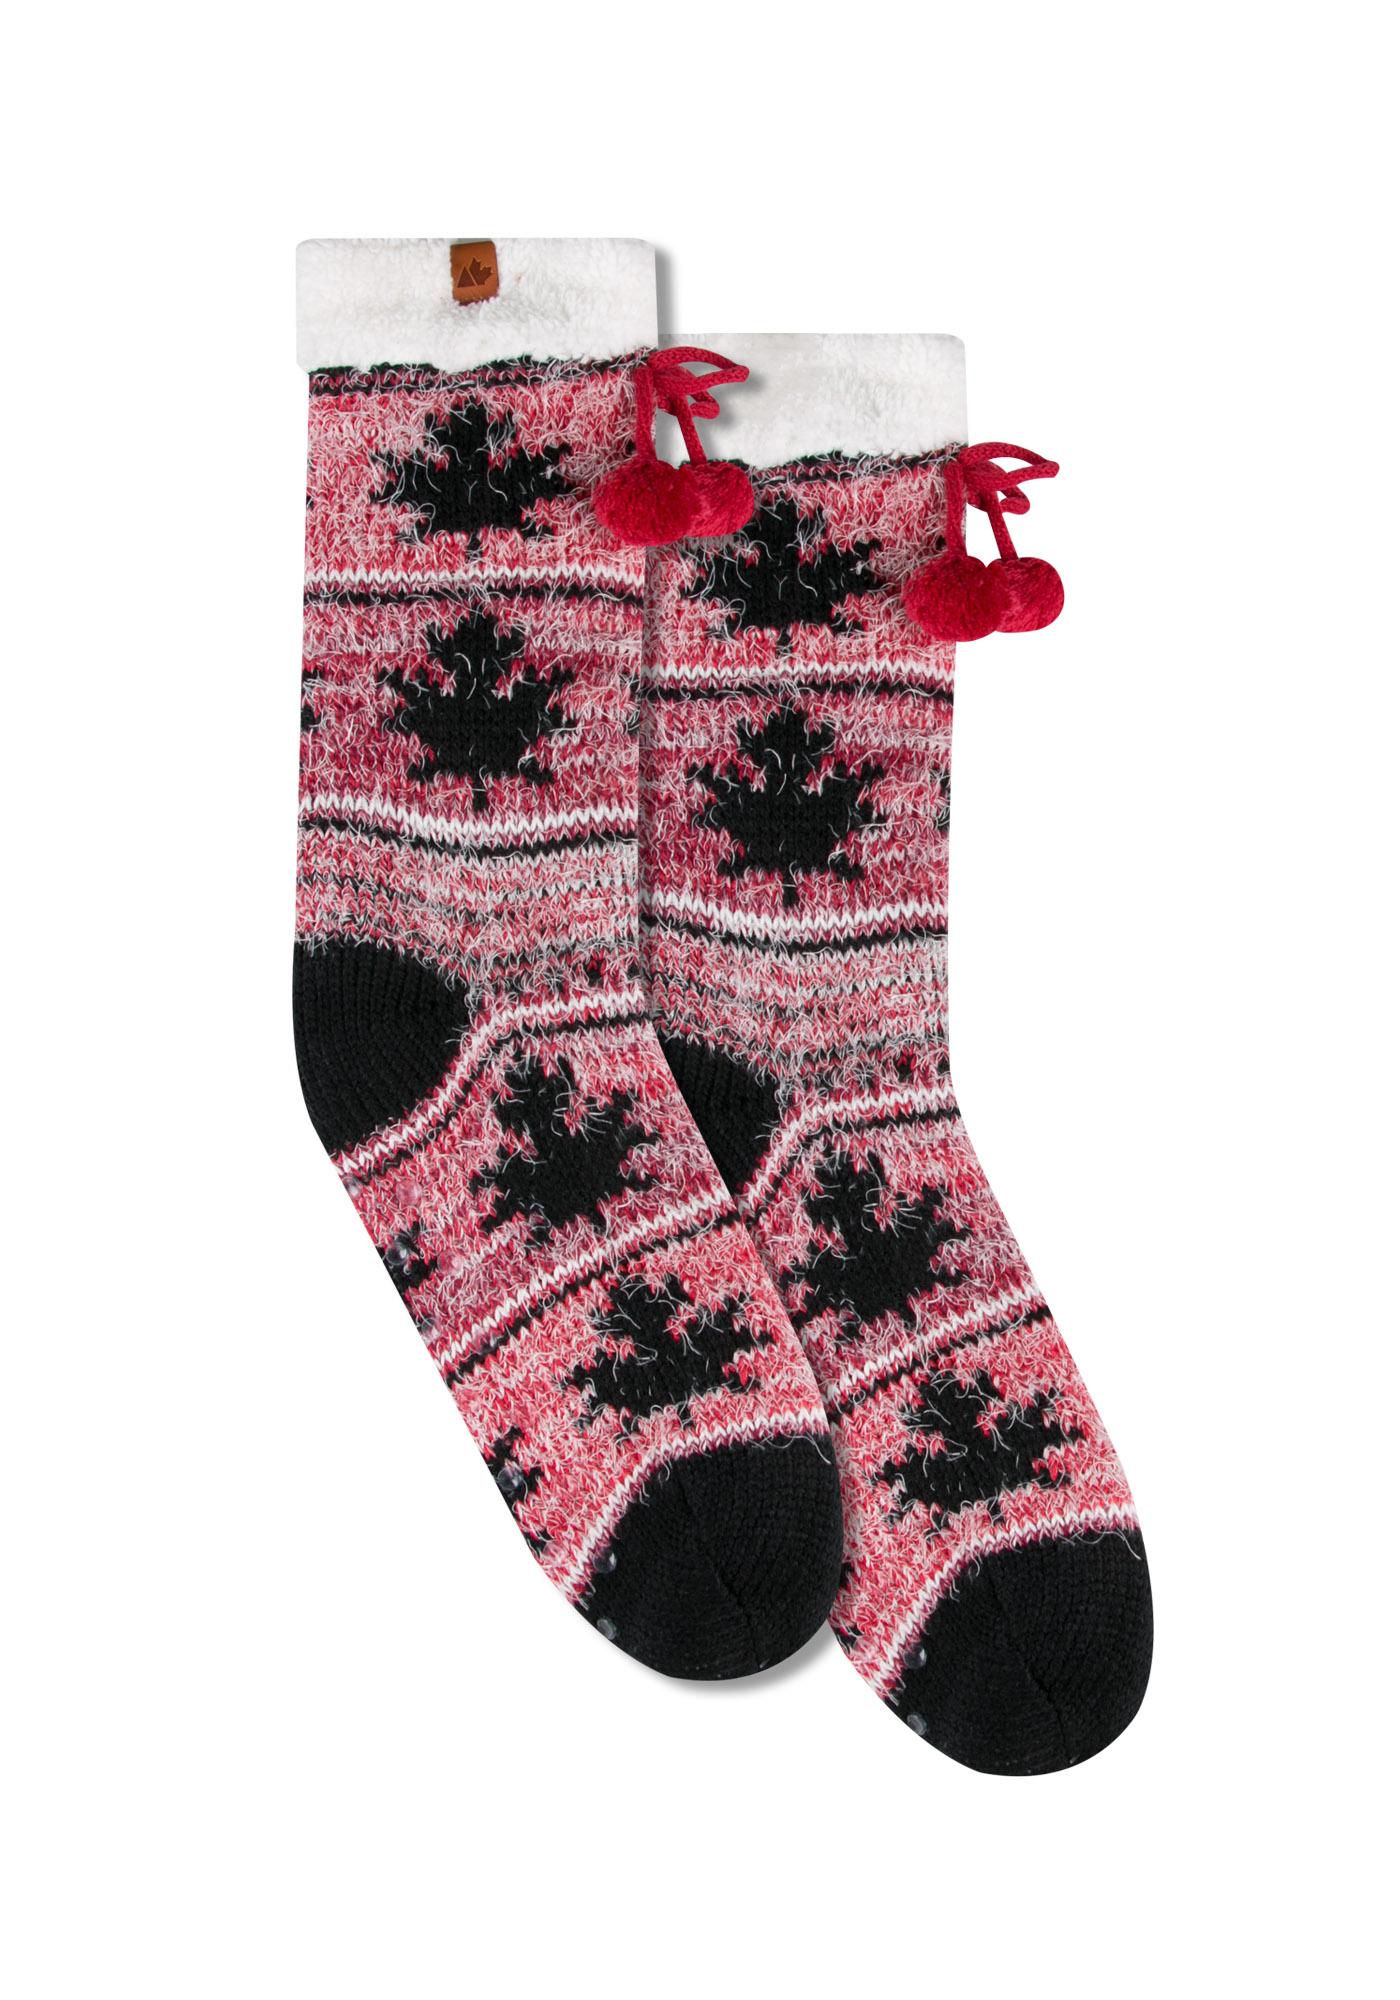 La s Canada Slipper Socks